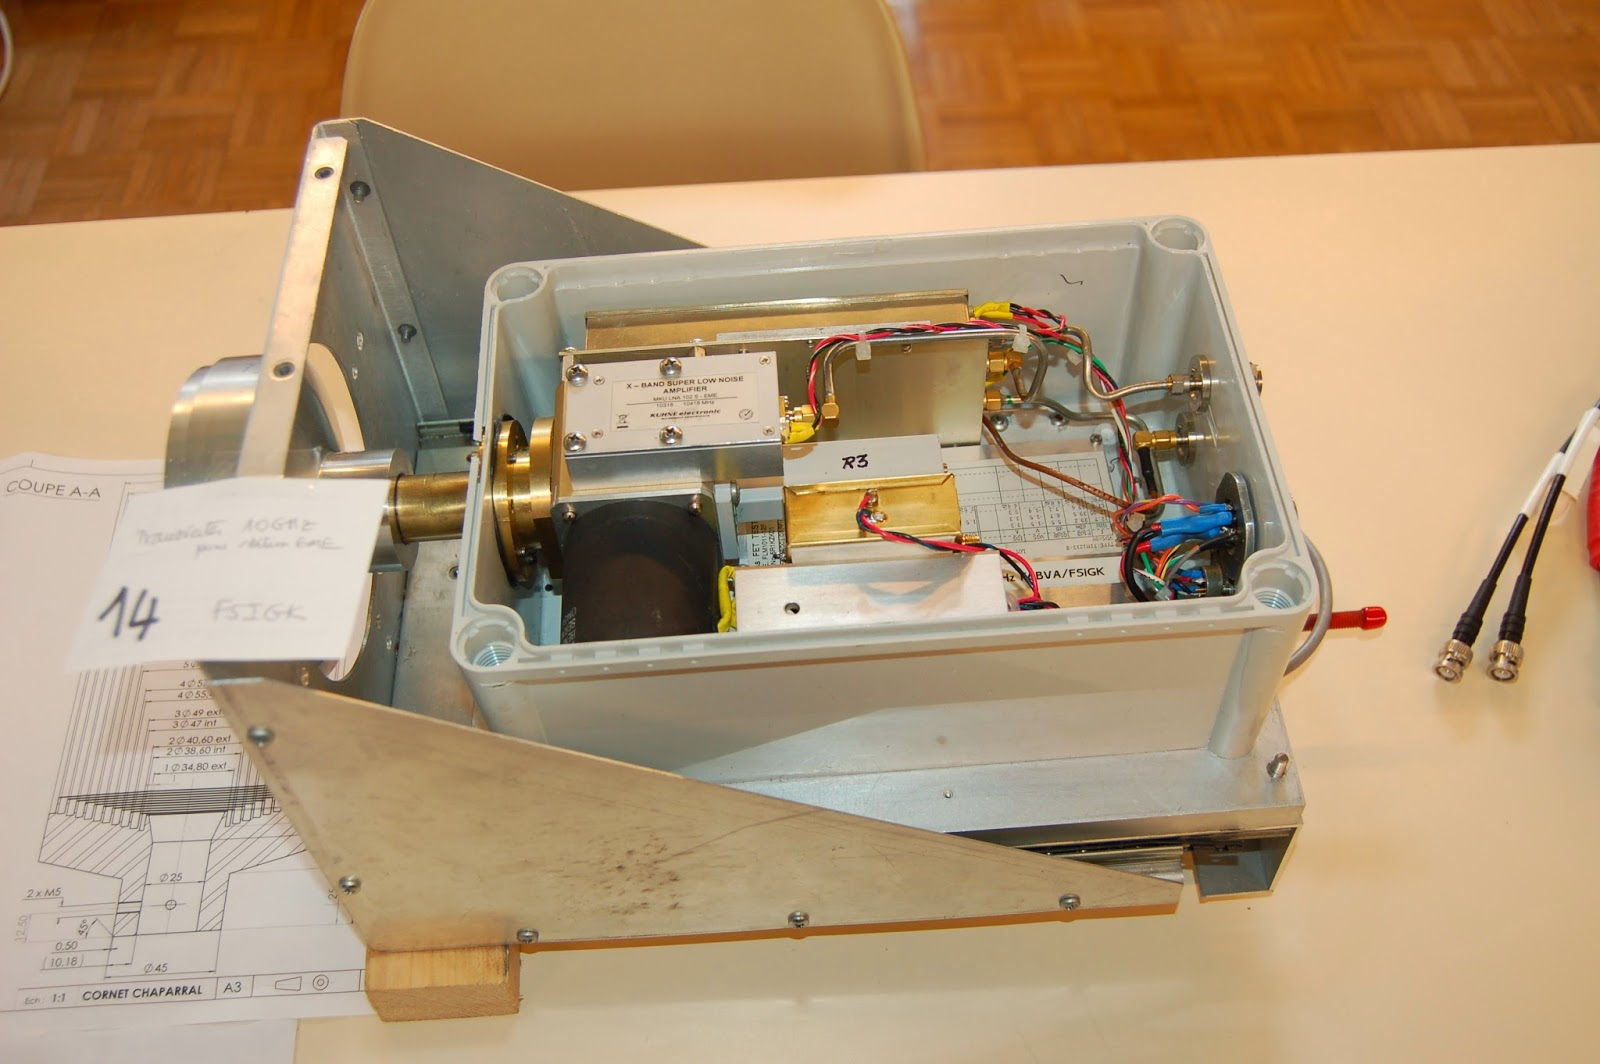 association des radioamateurs de la sarthe 04 12 14. Black Bedroom Furniture Sets. Home Design Ideas